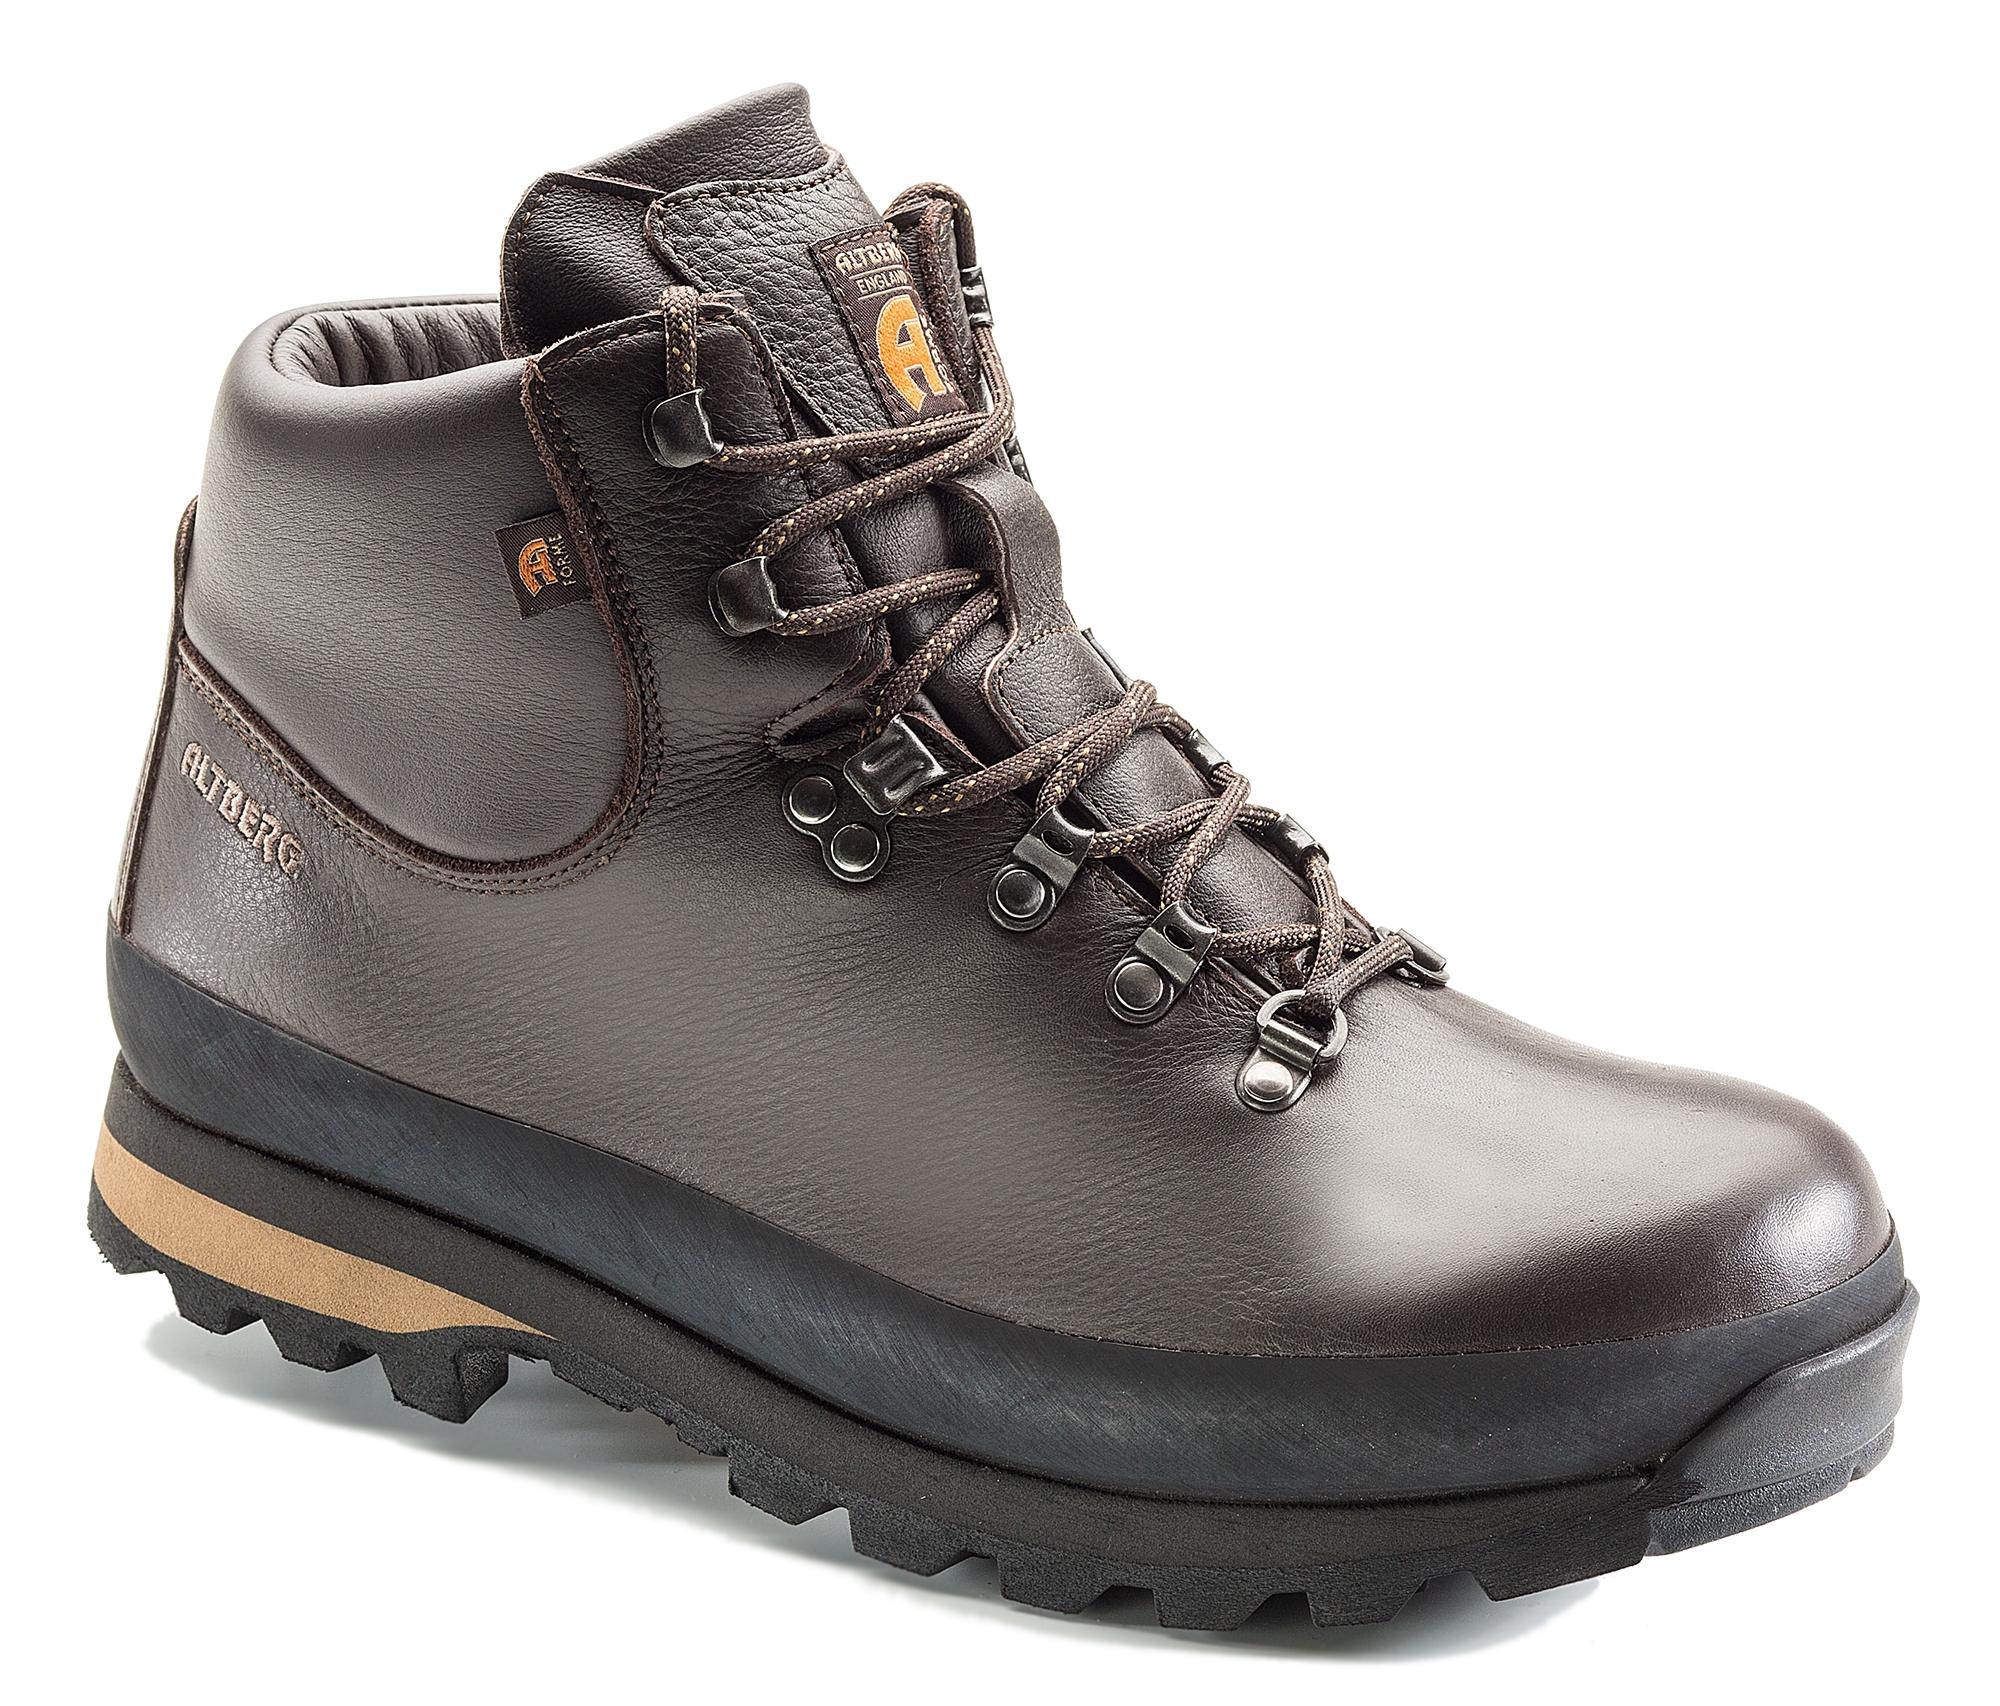 altberg boots stockists uk